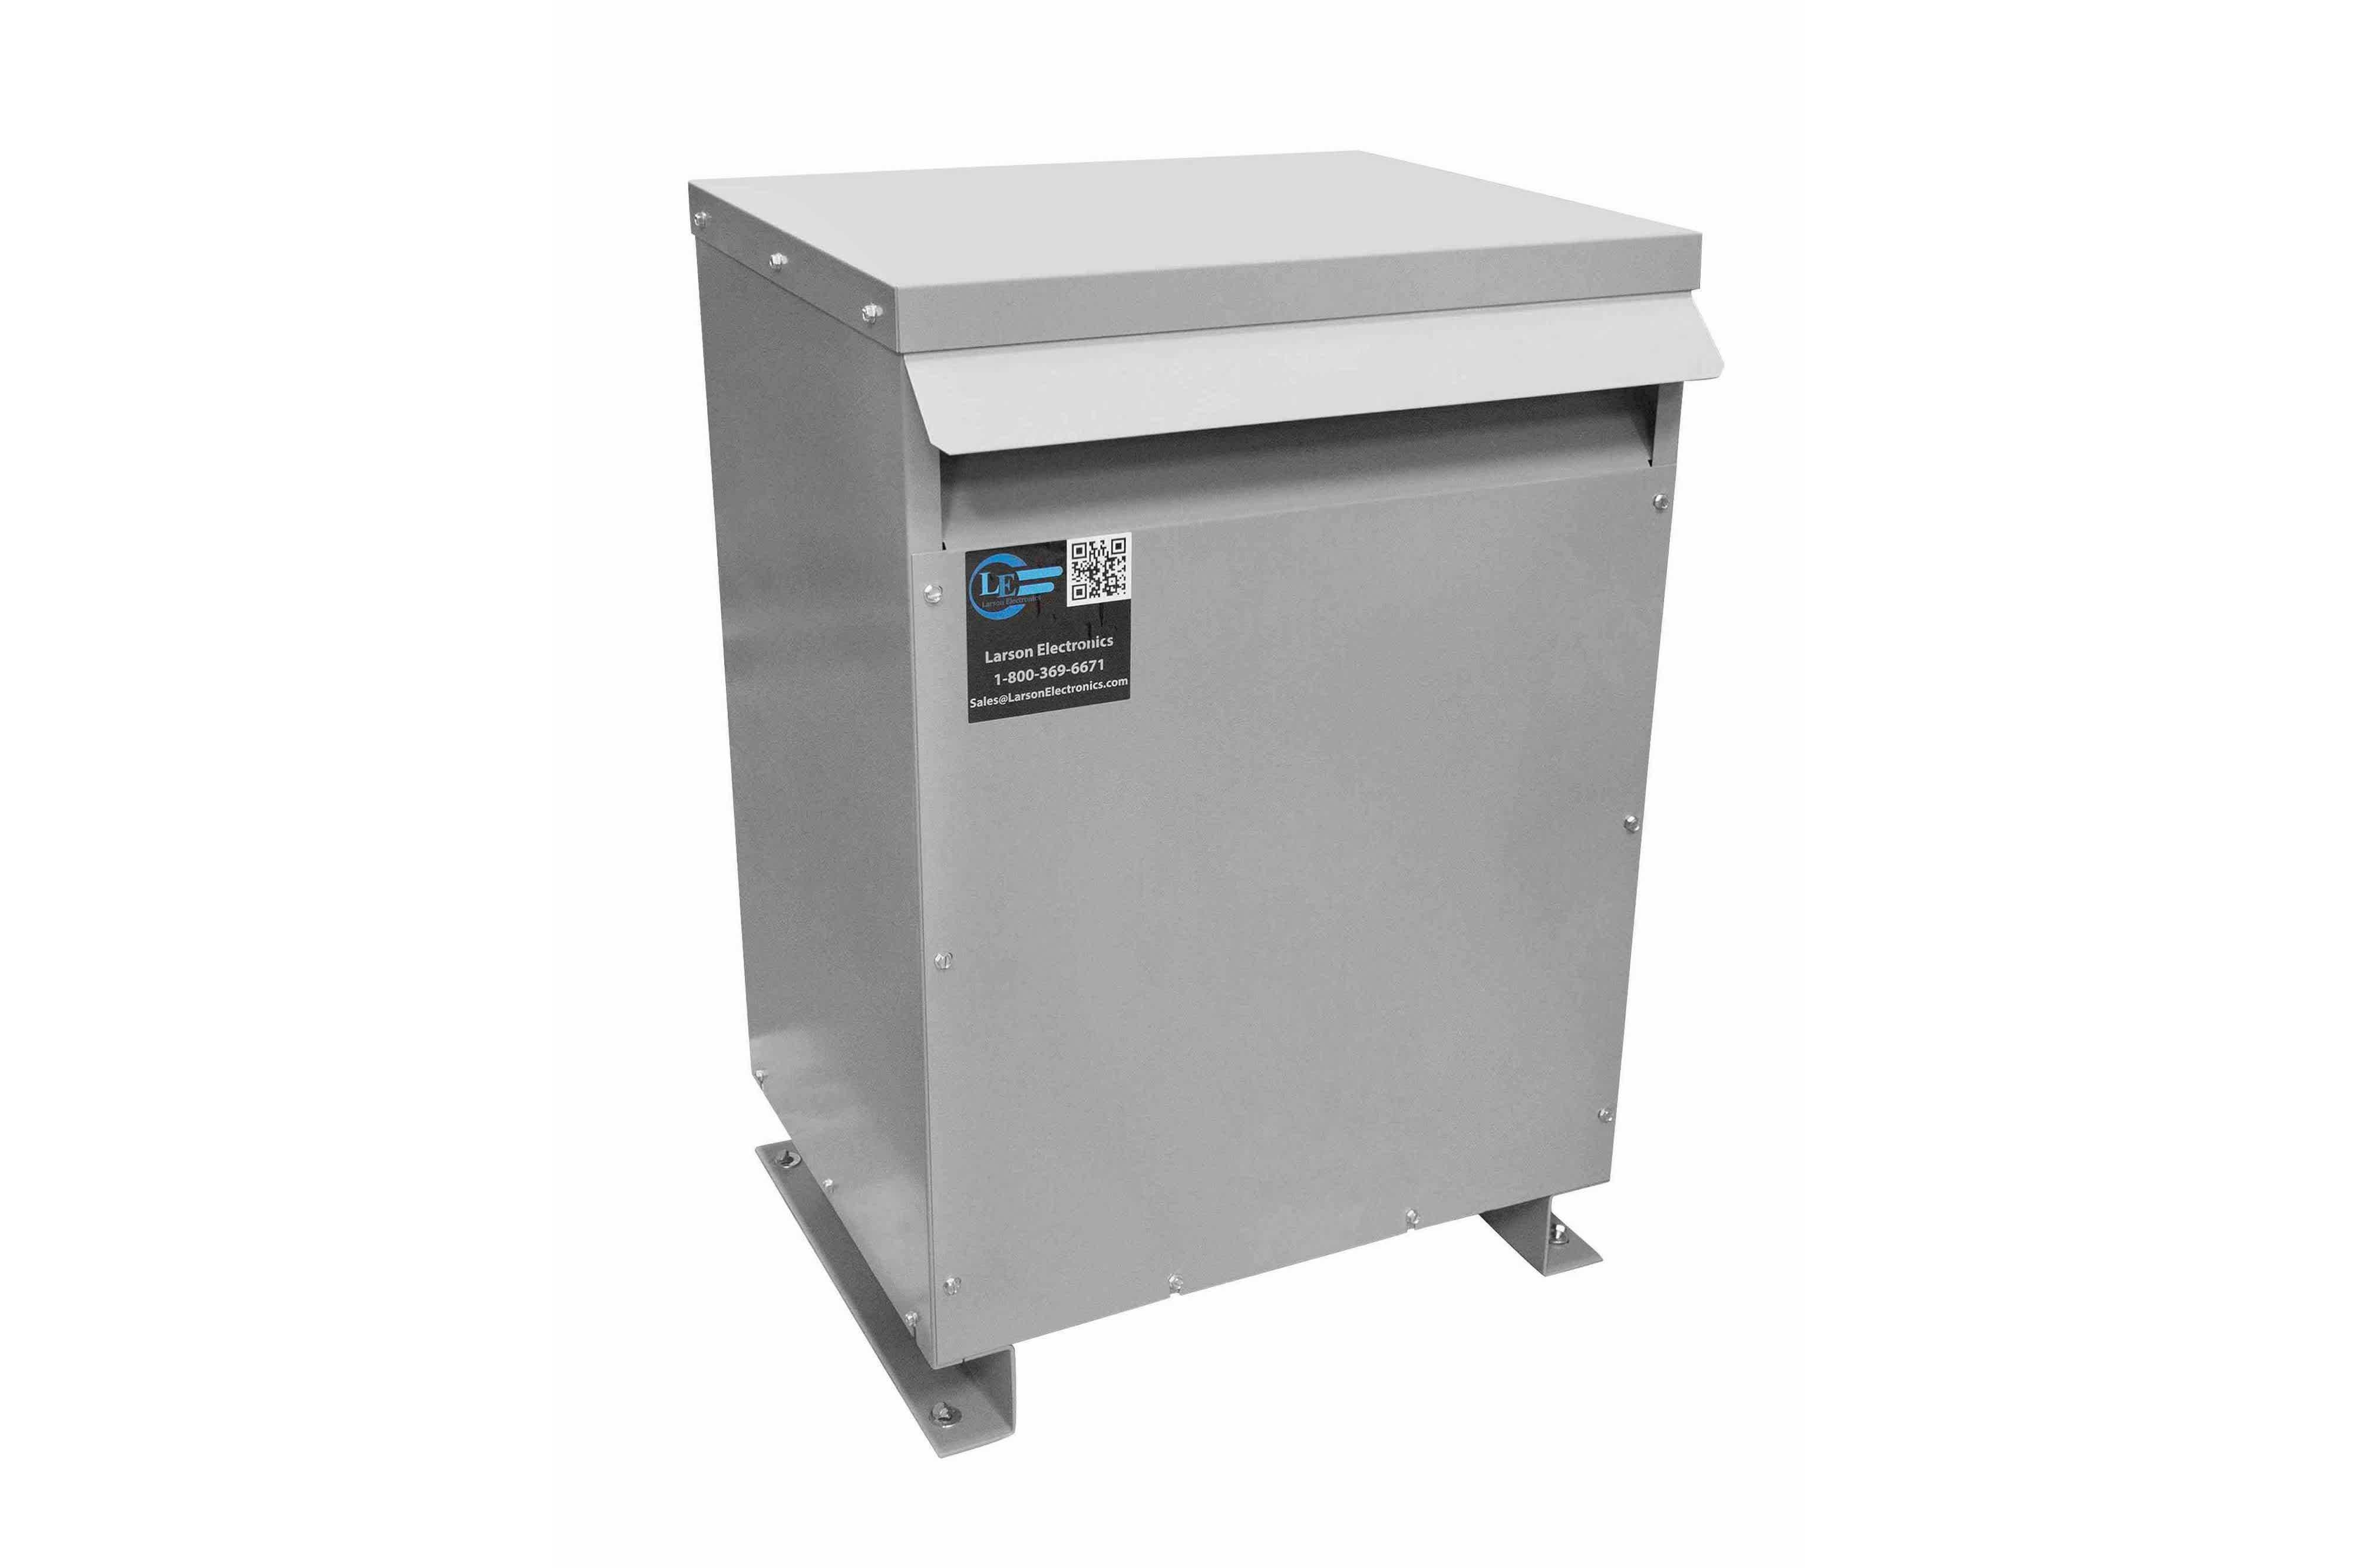 700 kVA 3PH Isolation Transformer, 480V Wye Primary, 380V Delta Secondary, N3R, Ventilated, 60 Hz